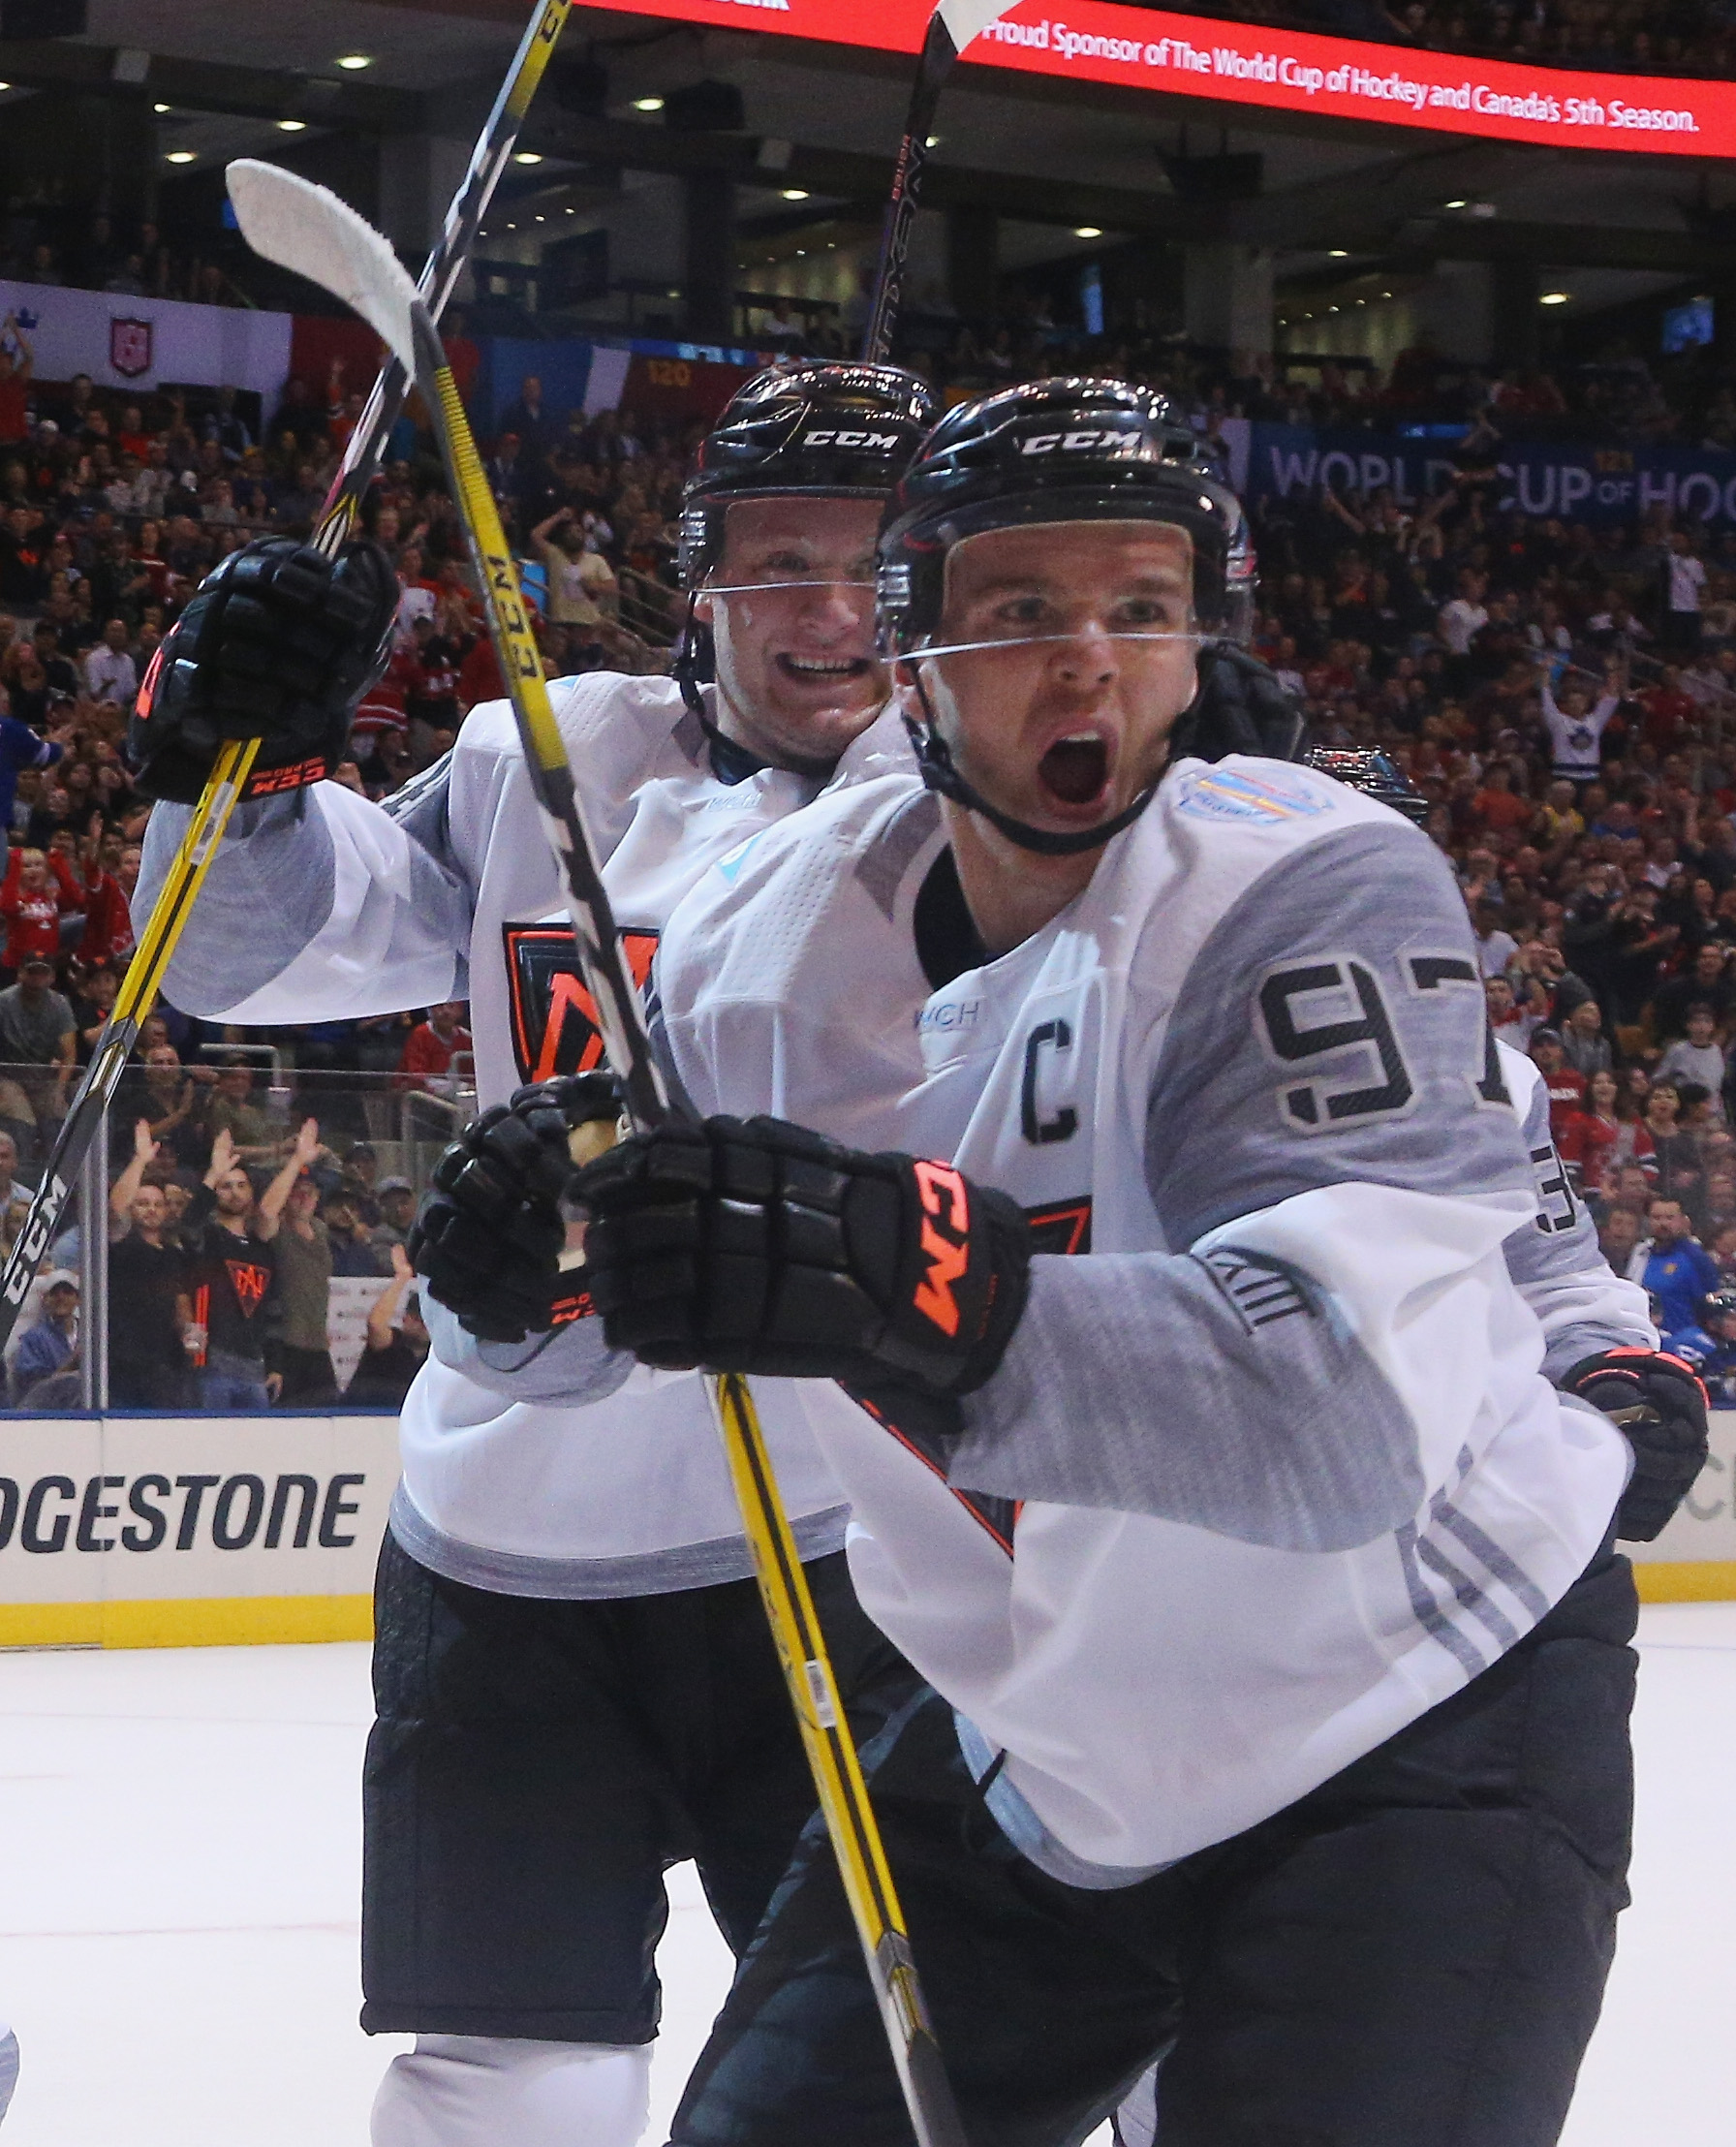 World Cup Of Hockey 2016 - Team North America v Team Finland